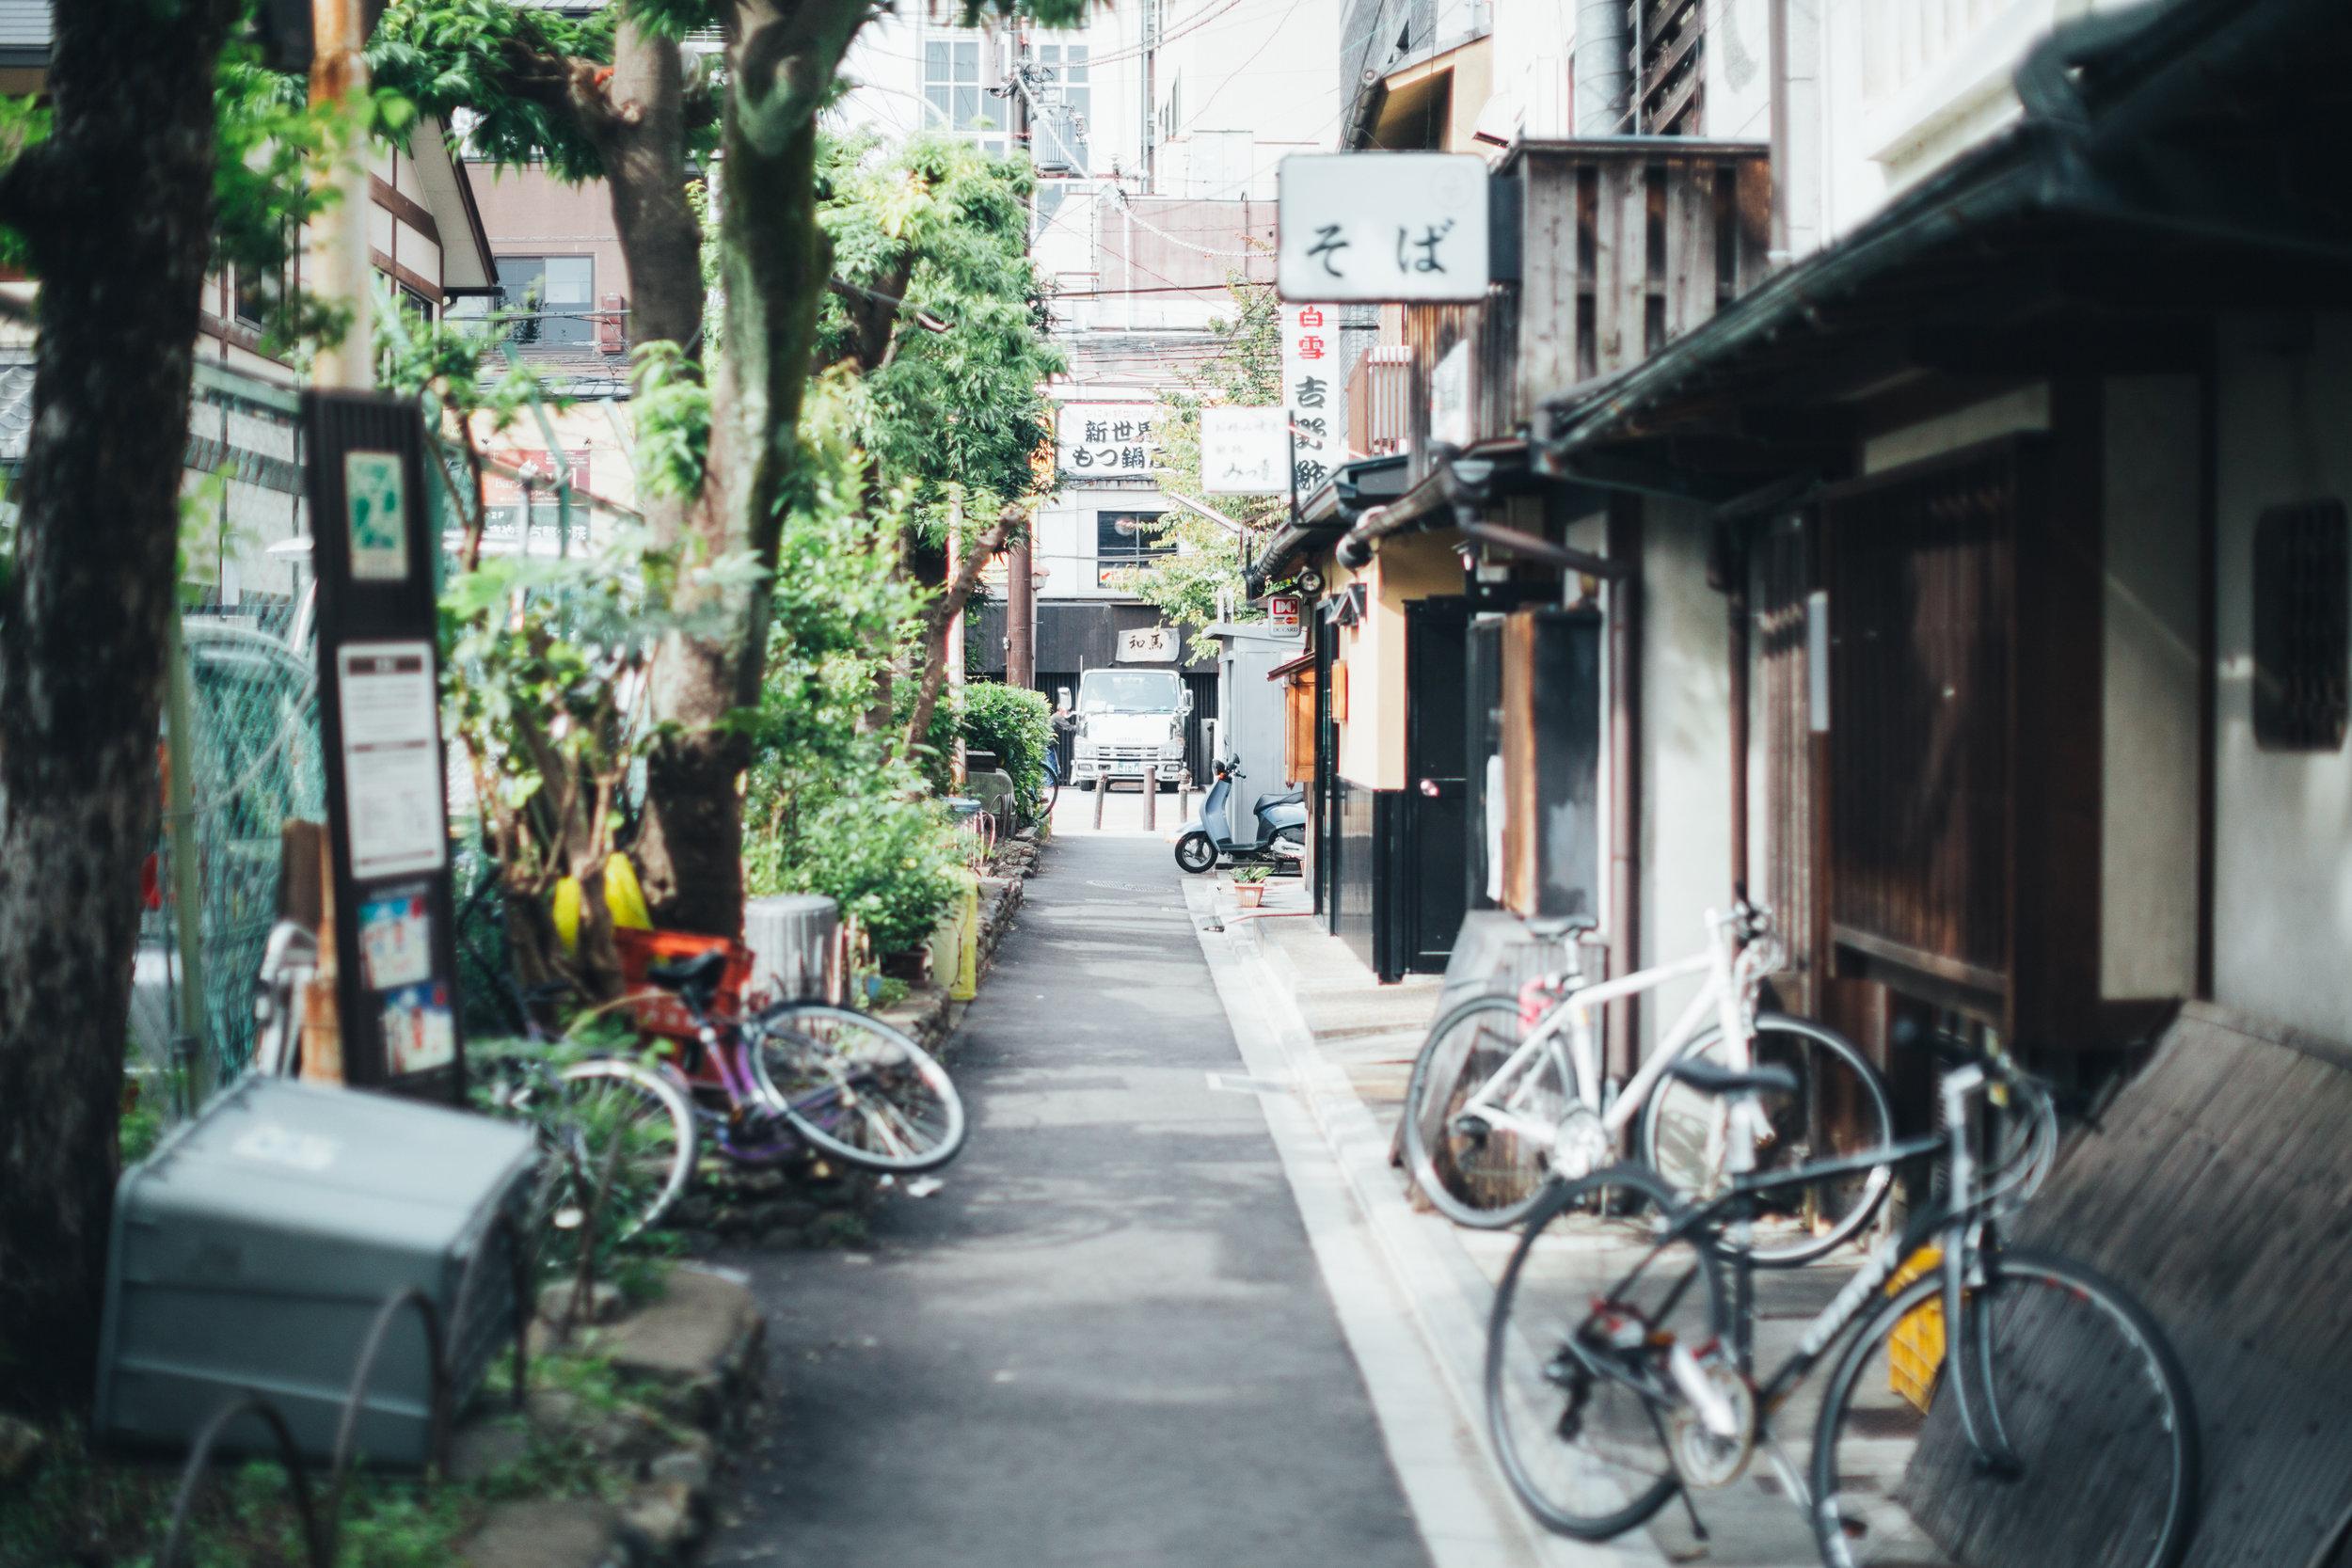 Bikes everywhere.